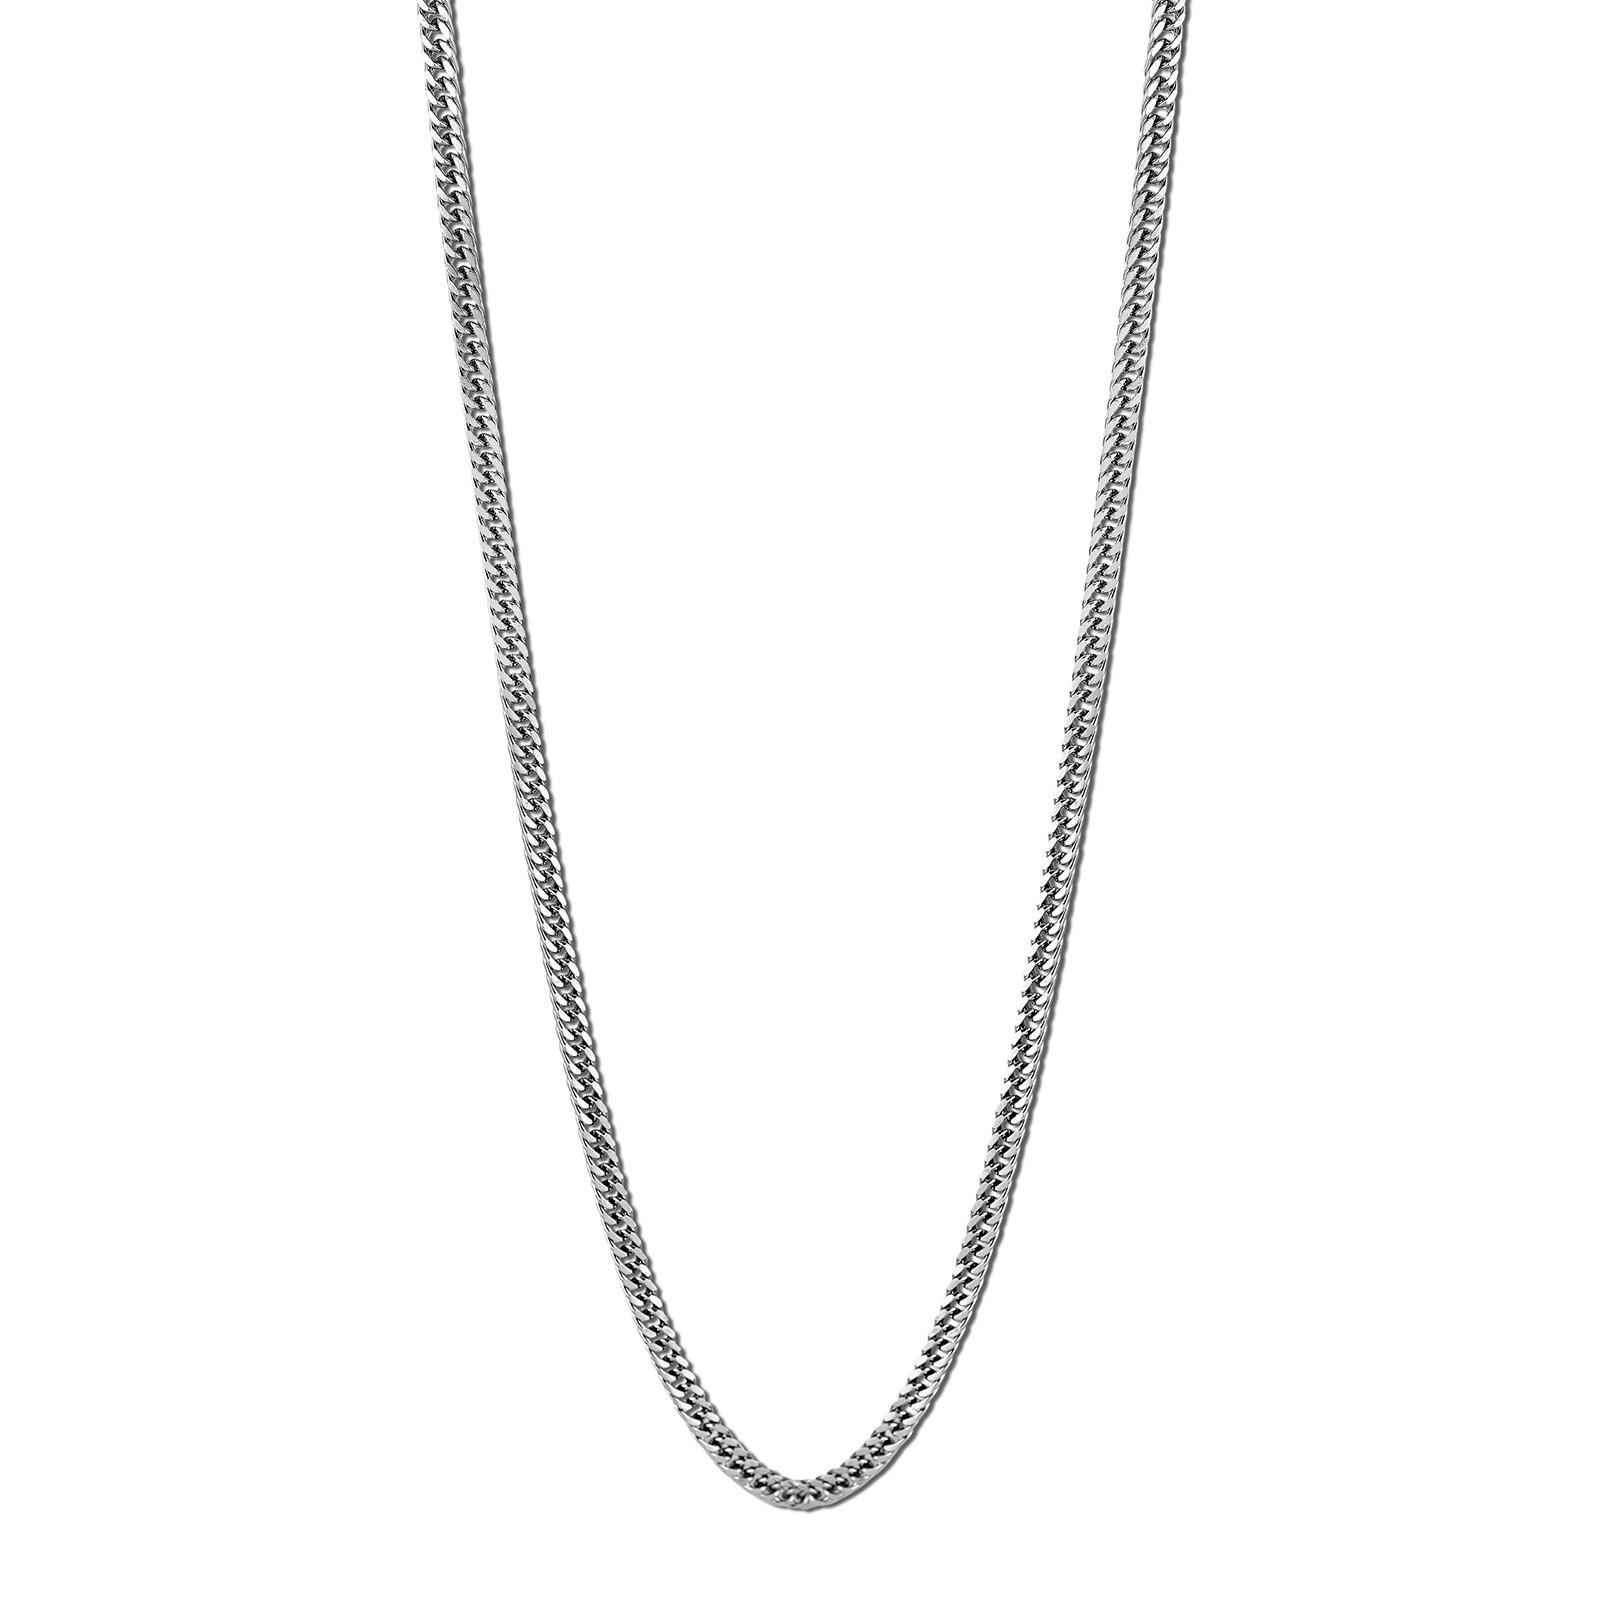 LOTUS Style Herren Halskette Men in Black-Kollektion Edelstahl JLS1682-1-1